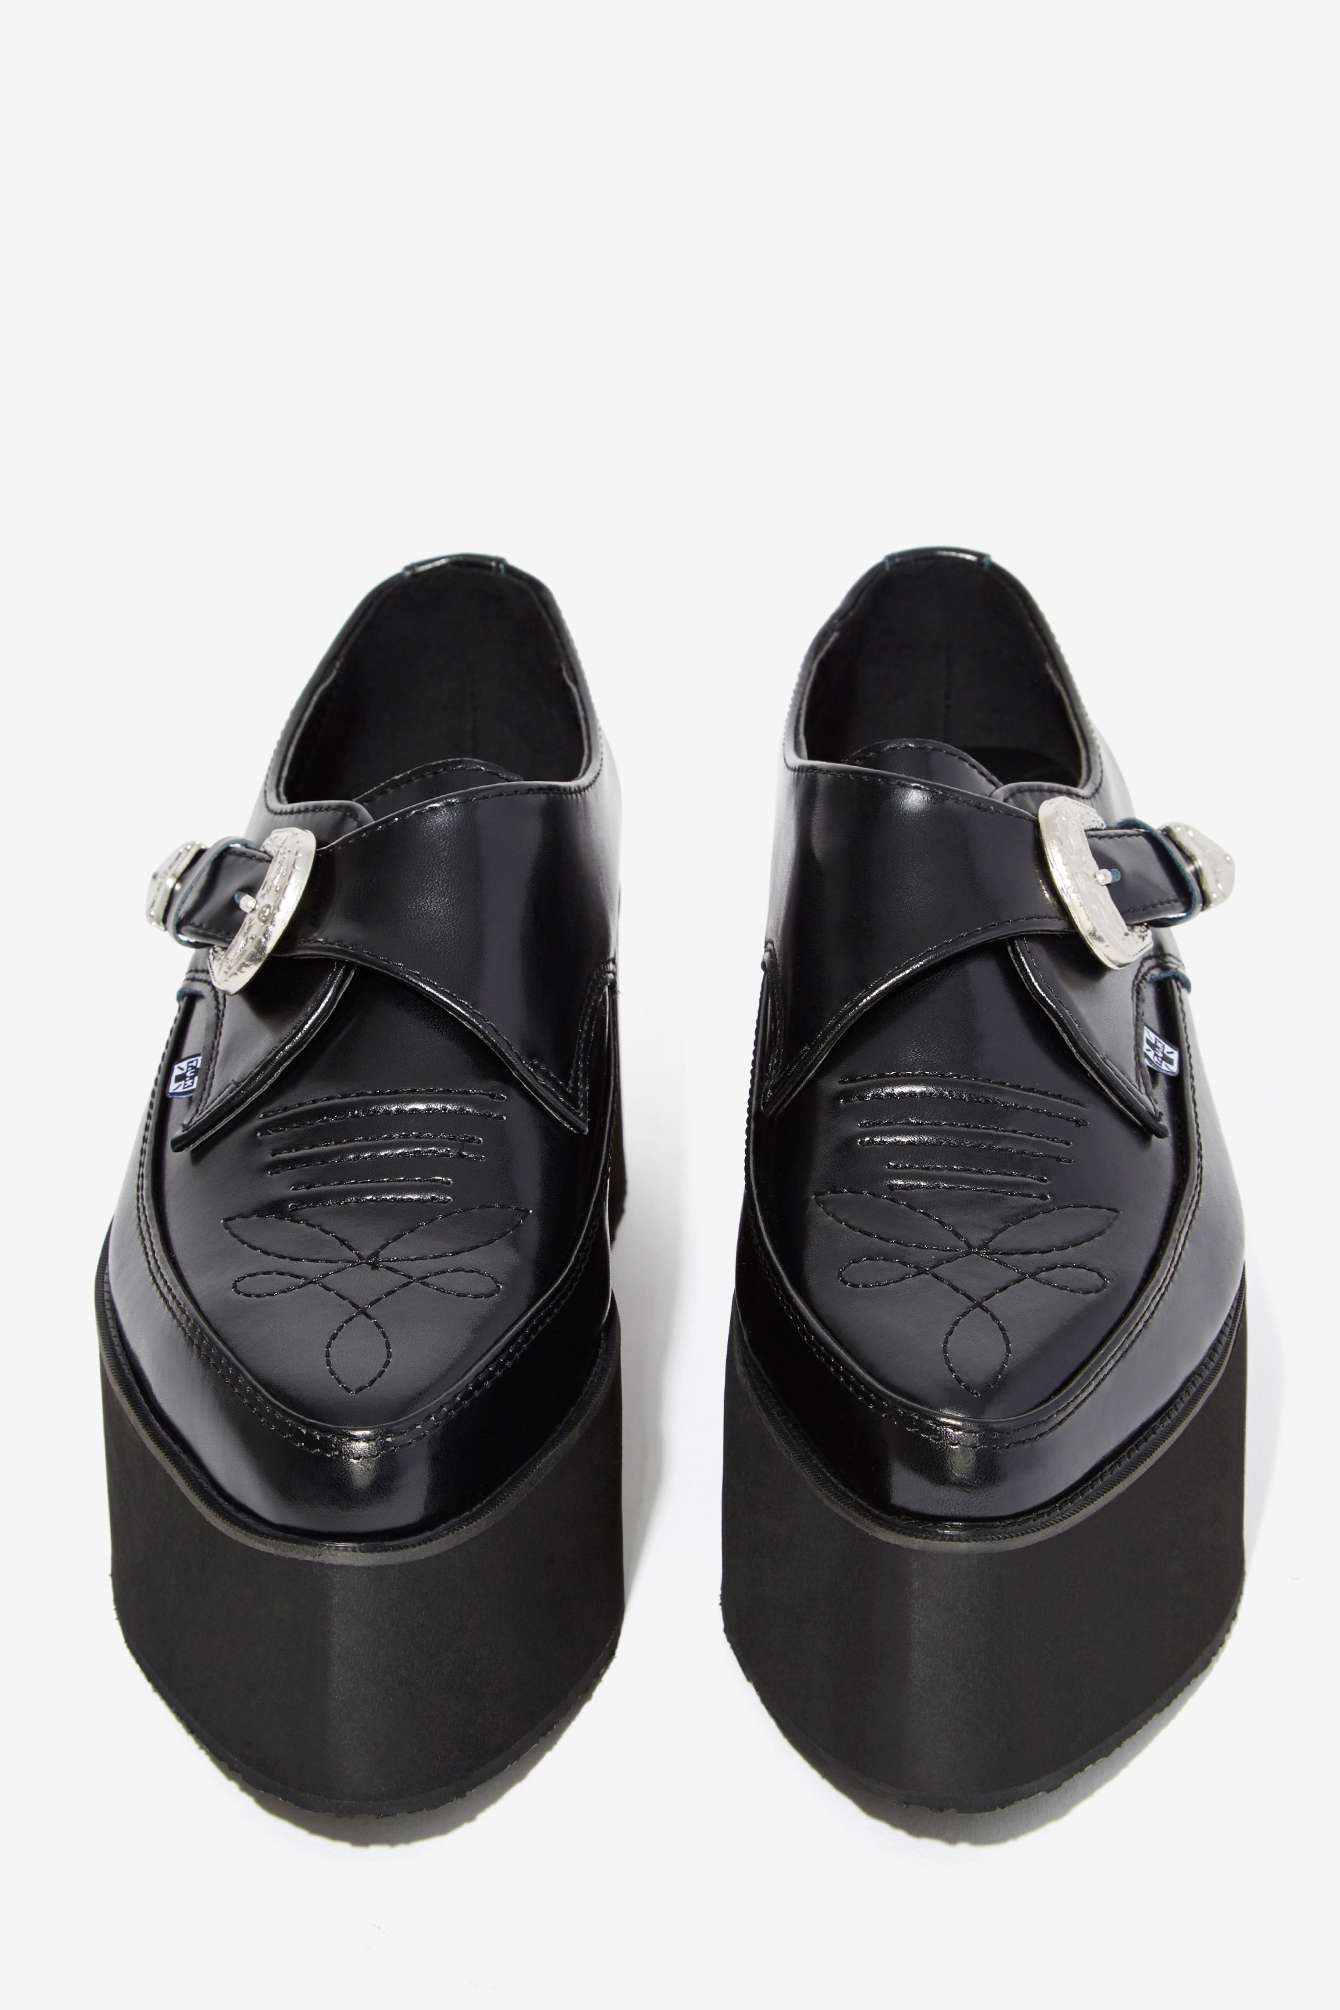 777b0b7fb8ab0 23 Platform Shoes To Rock This Spring Because Prints   Flatforms Are  Everything — PHOTOS